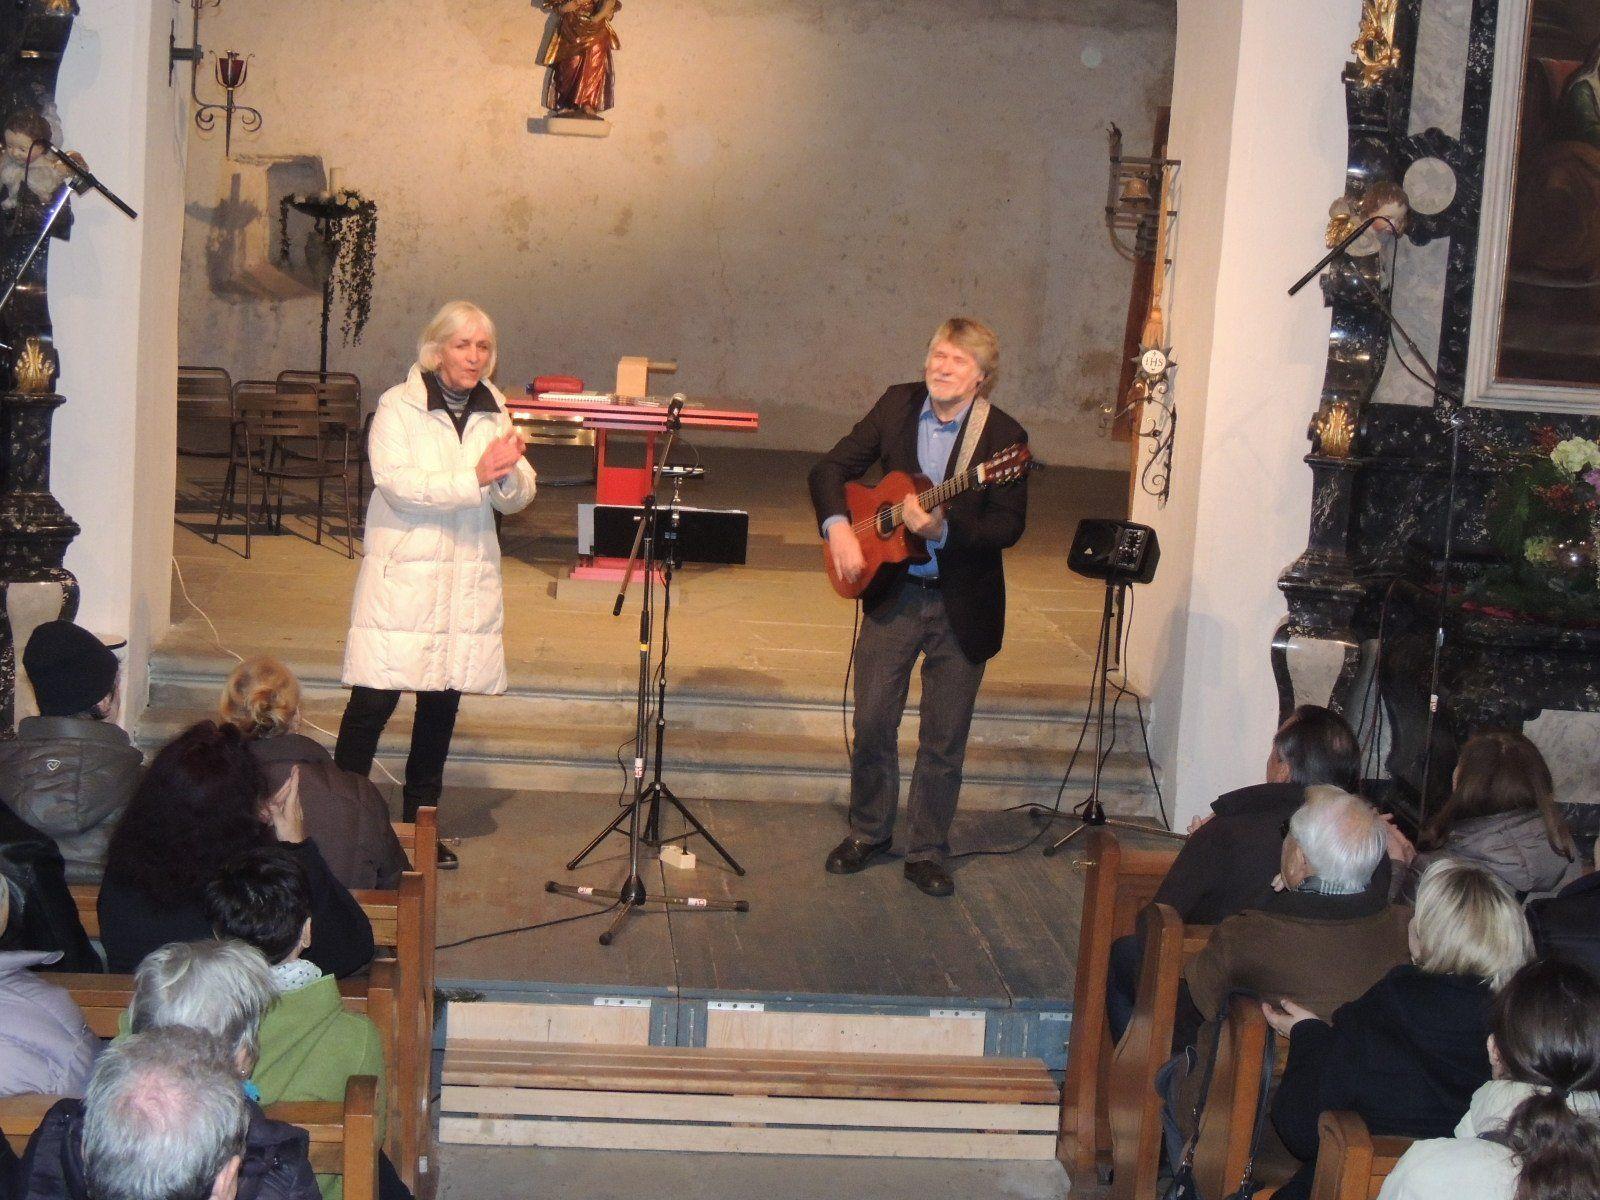 Unterhaltsames Konzert in der Martinskapelle